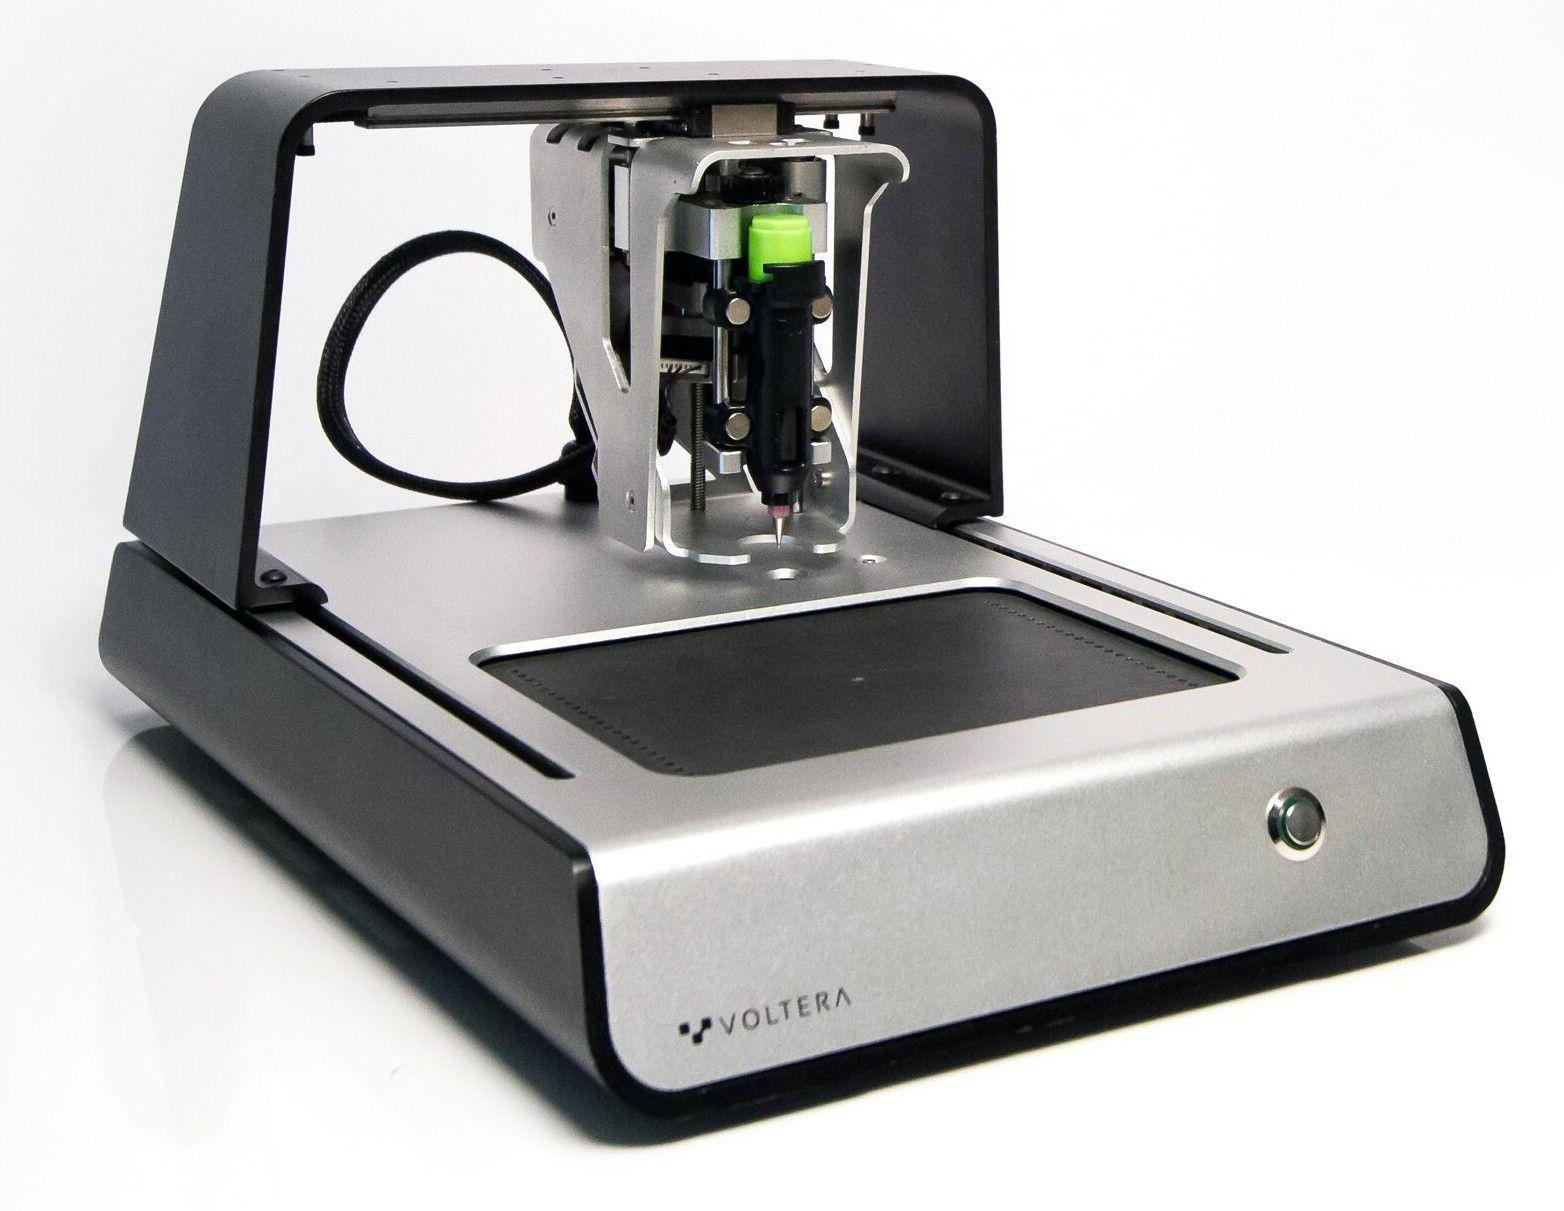 Voltera V-One Desktop PCB Printer - Elektor